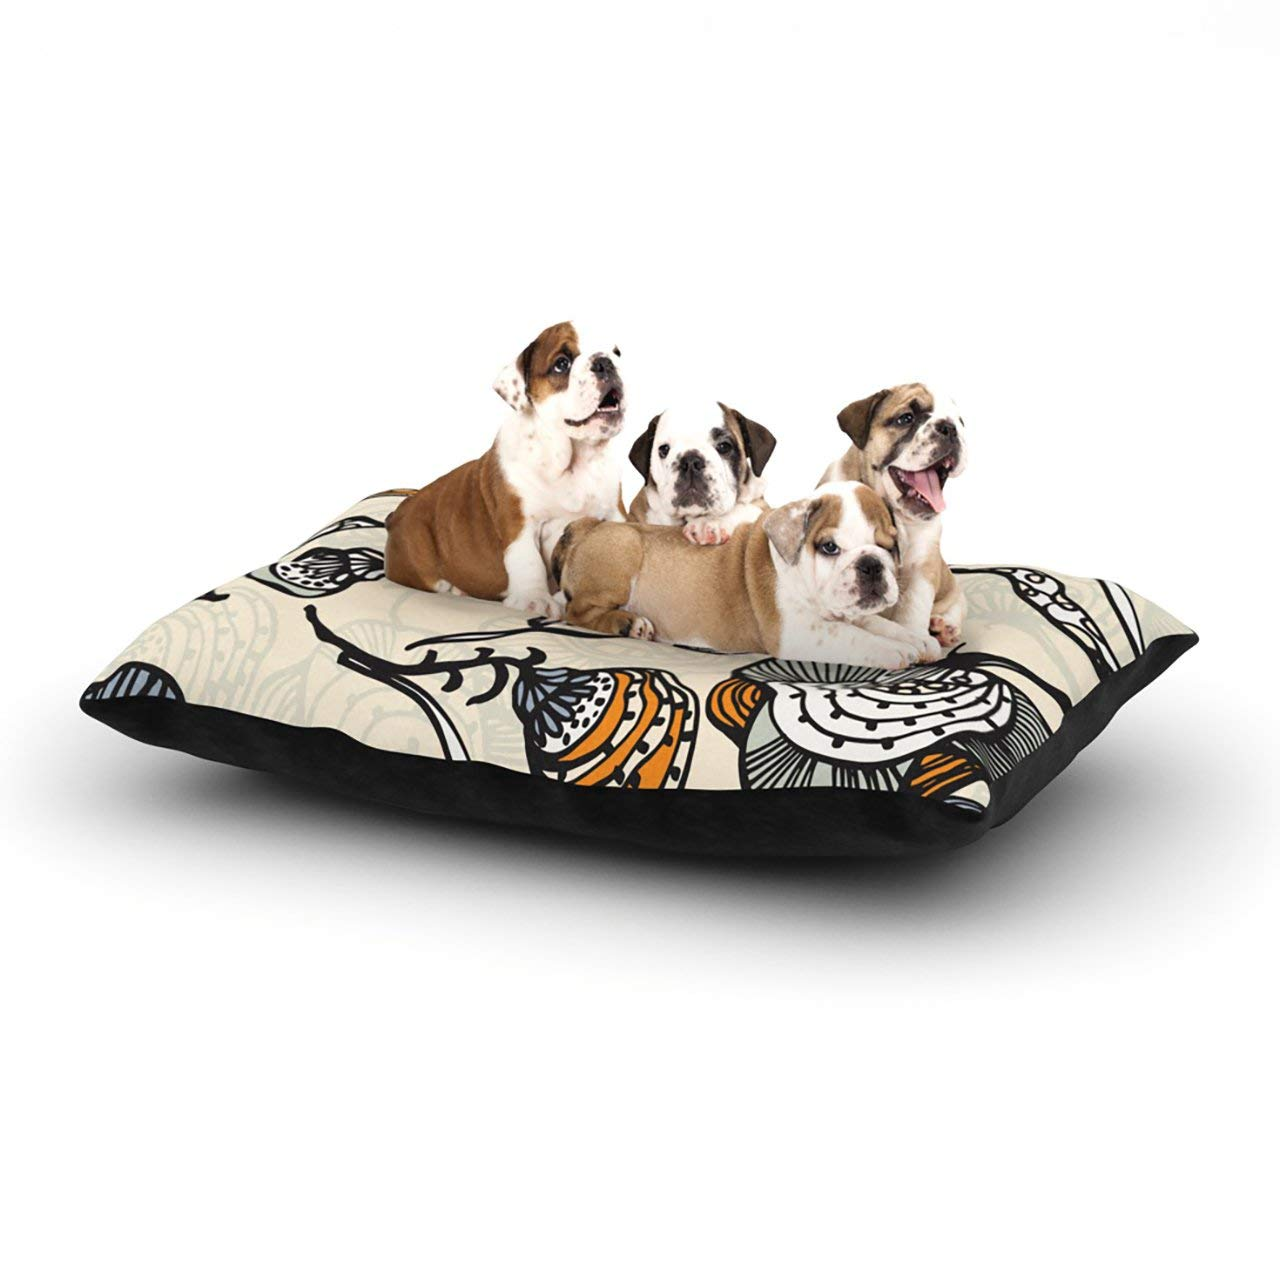 "Kess InHouse Gill Eggleston ""Future Nouveau"" Tan Floral Dog Bed"